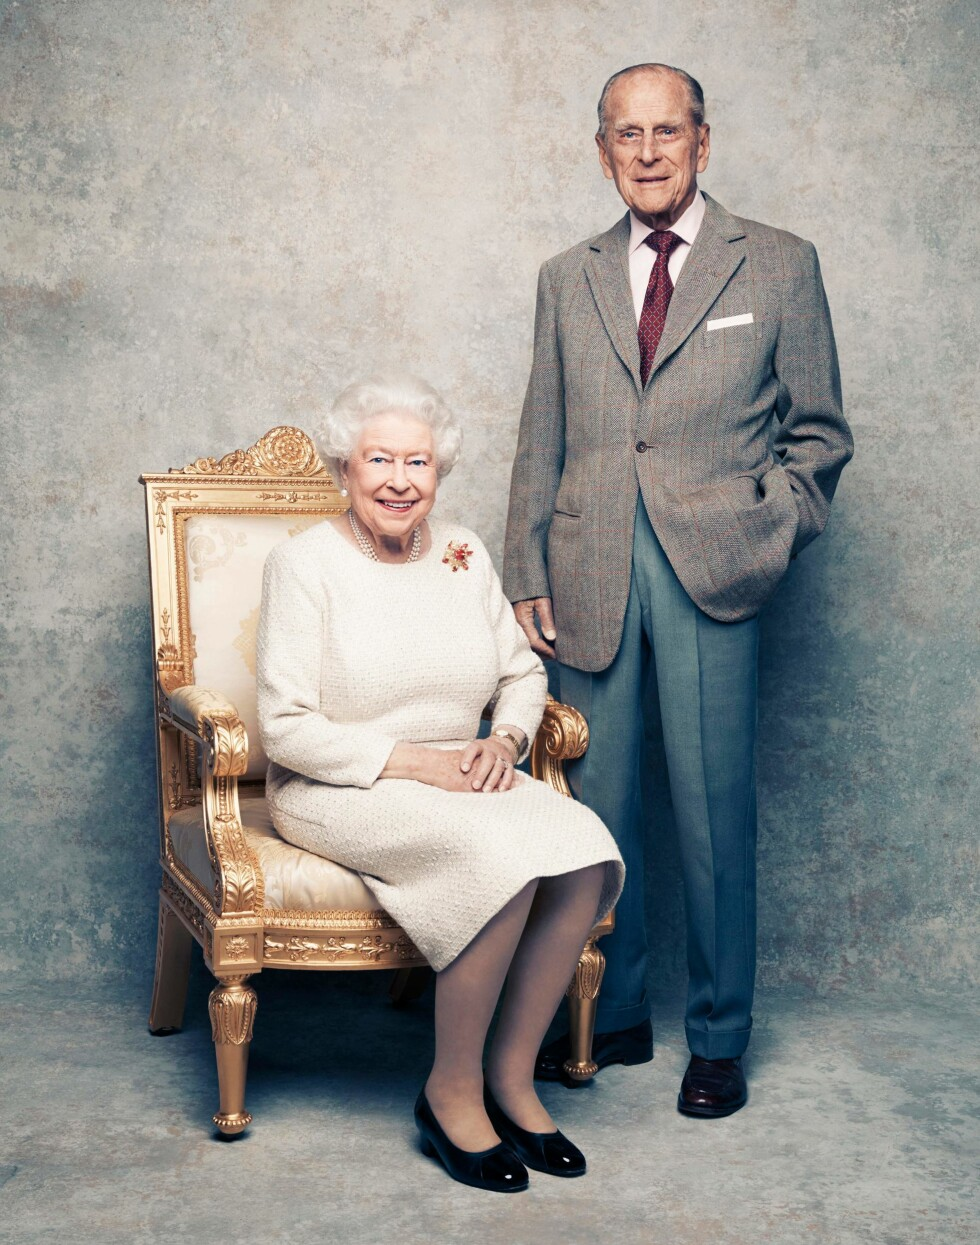 BRYLLUPSFOTO: Den britiske fotografen Matt Holyoak fotograferte dronning Elizabeth og prins Philip i anledning parets 70 års bryllupsdag i november 2017. FOTO: NTB Scanpix